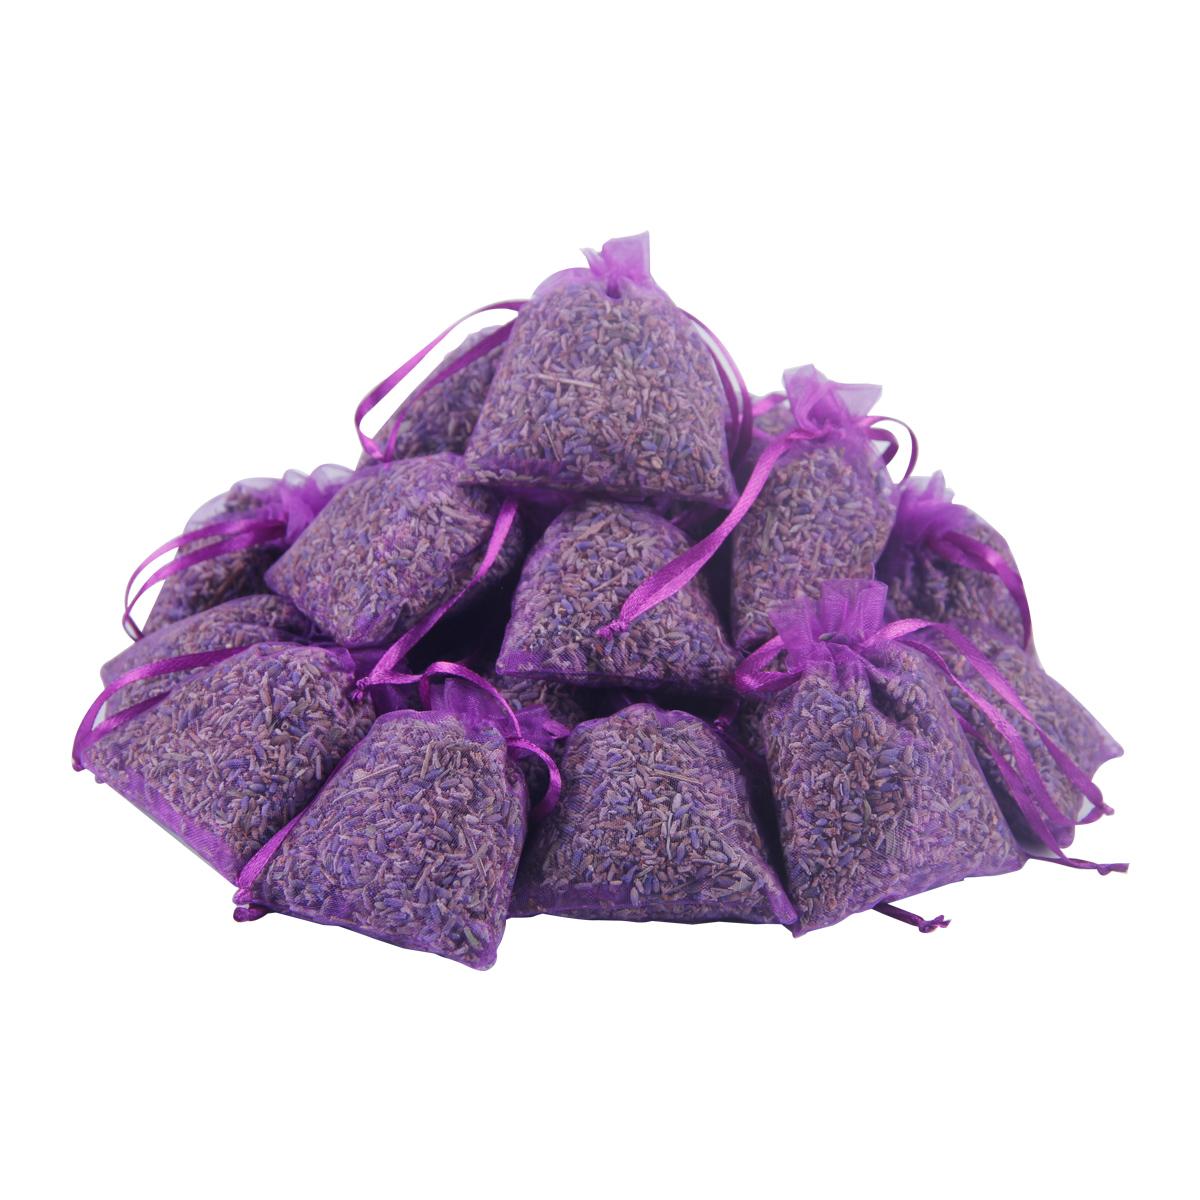 High quality dried lavender seeds fragrance lavender plants farm flowers buds sachet bag harvester for sale - 4uTea | 4uTea.com